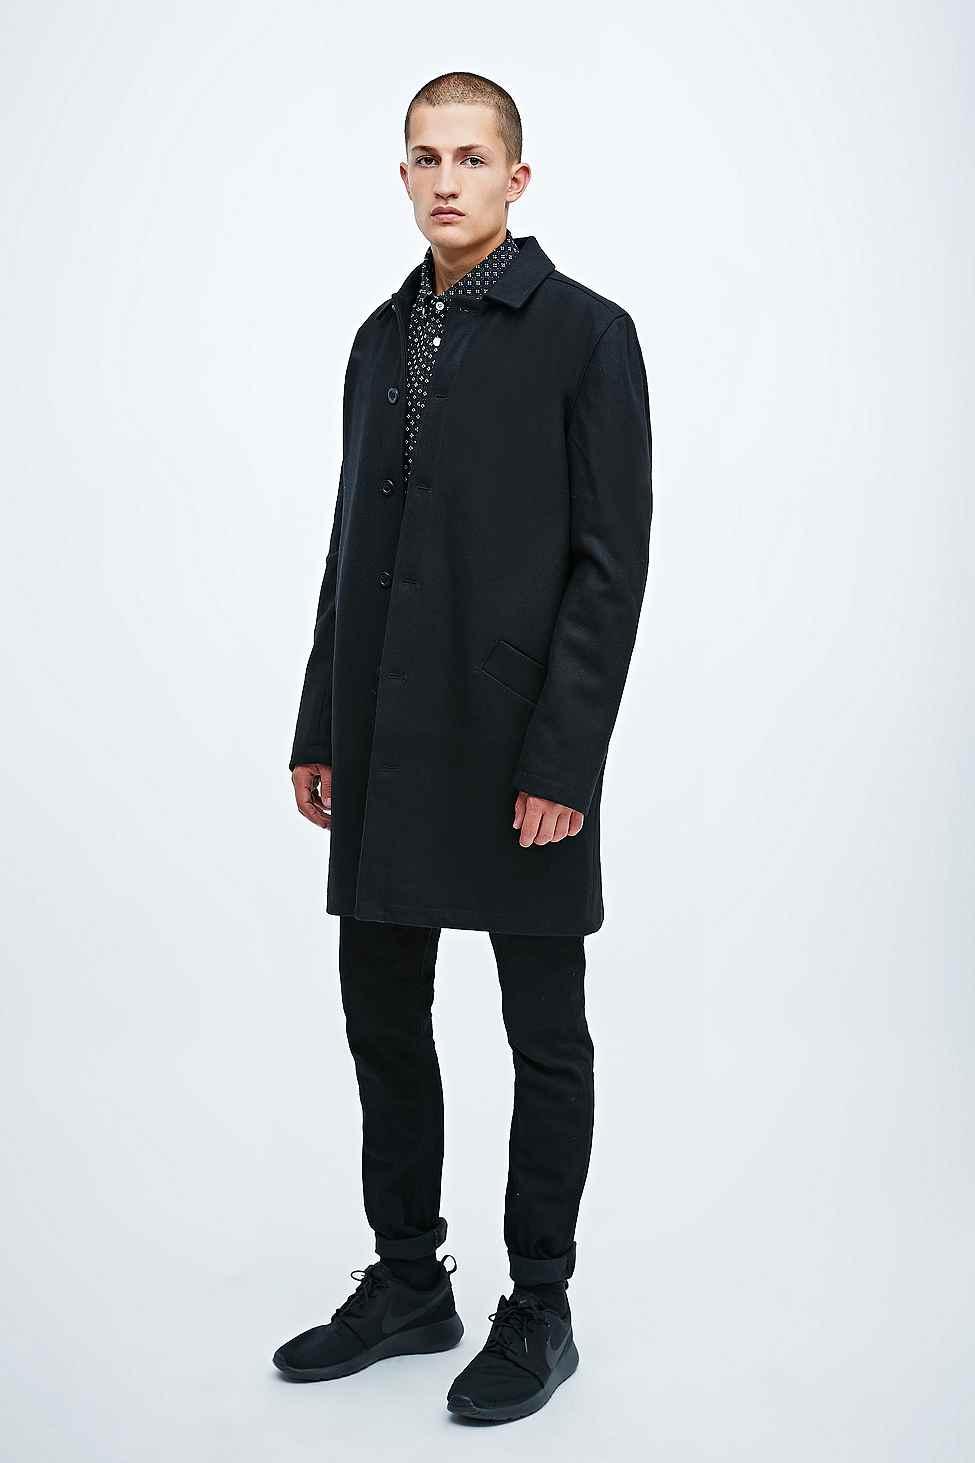 Libertine-libertine Toddler Wool Mac Jacket In Black in Black for ...